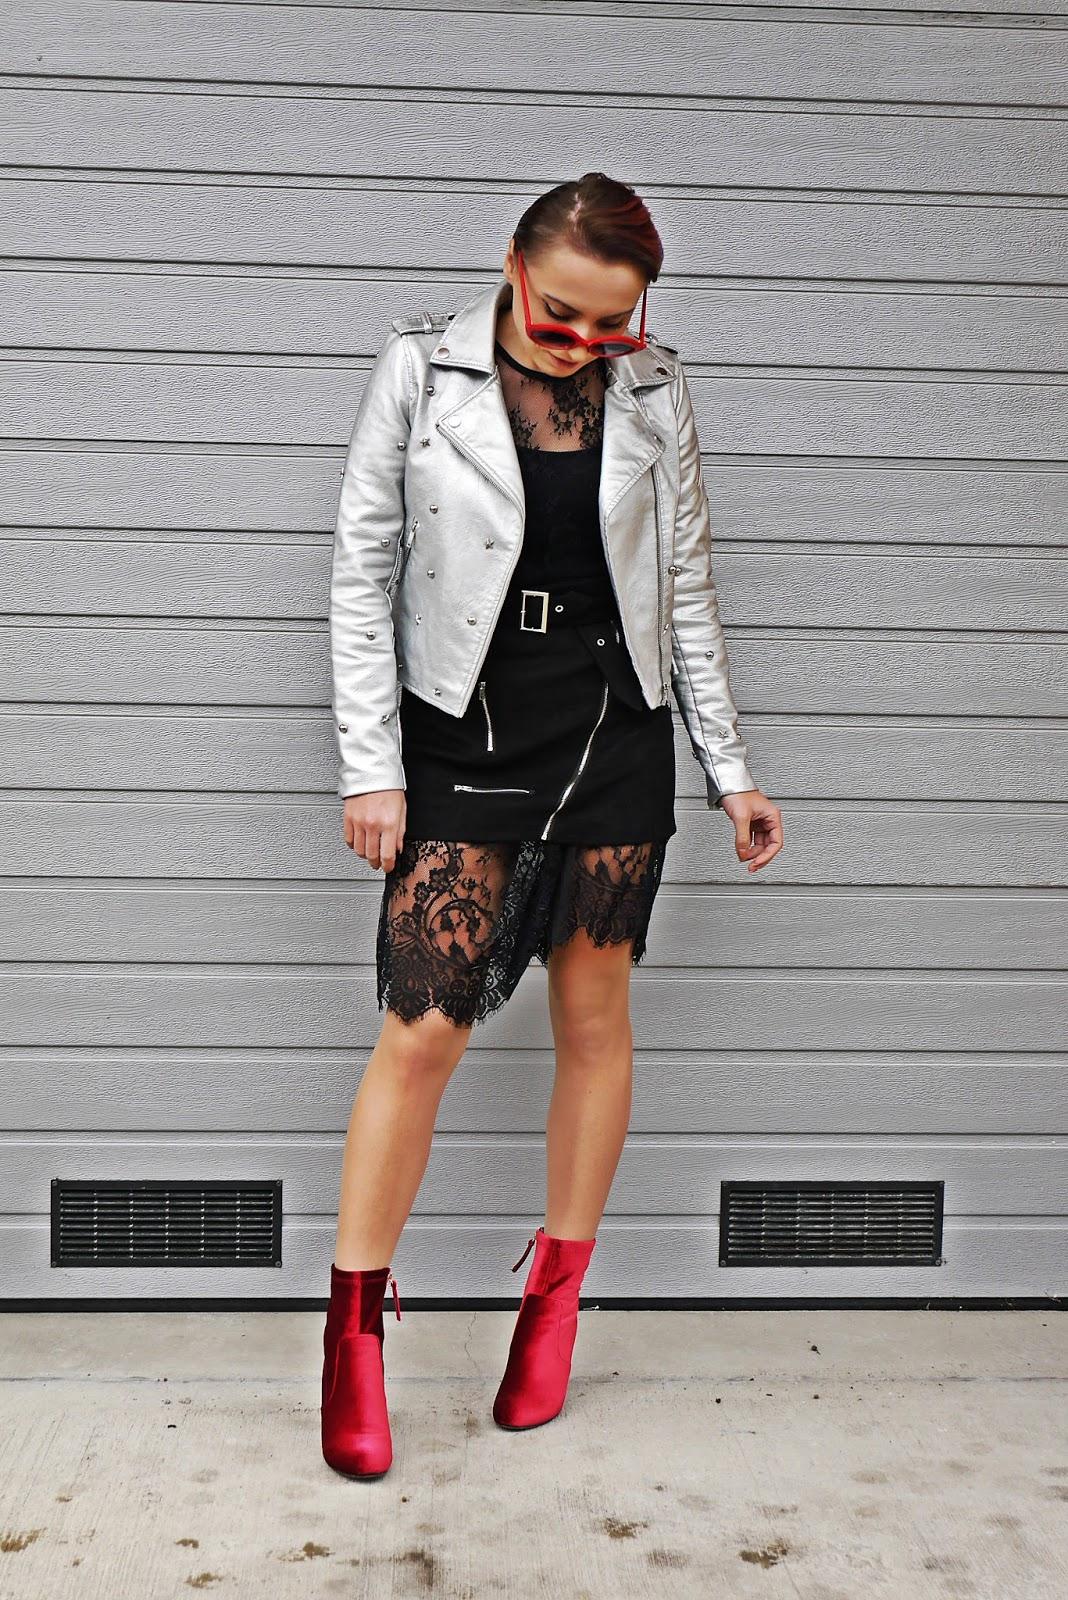 1_silver_biker_jacket_asimetric_skirt_karyn_blog_modowy_091017